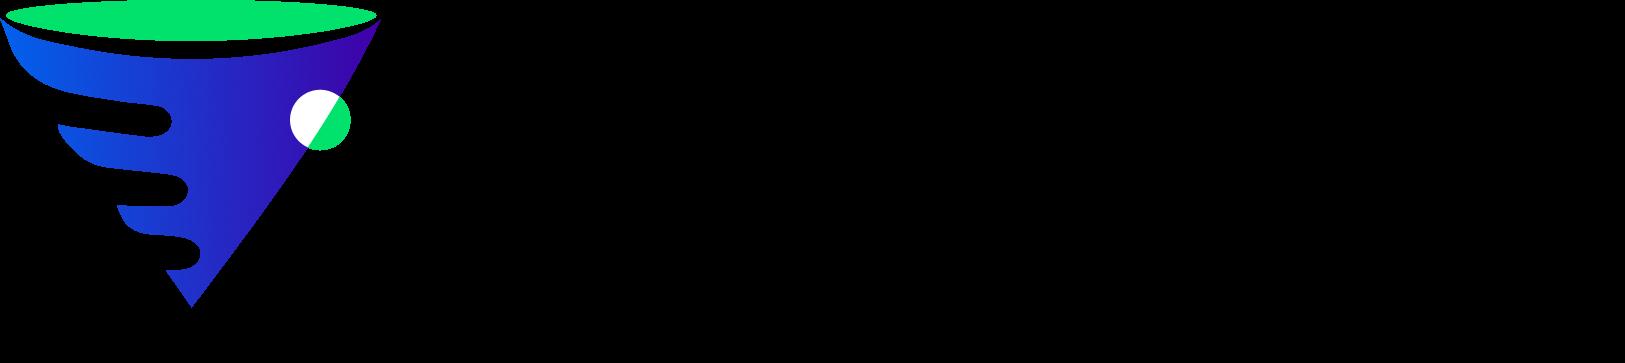 Krayen Logo